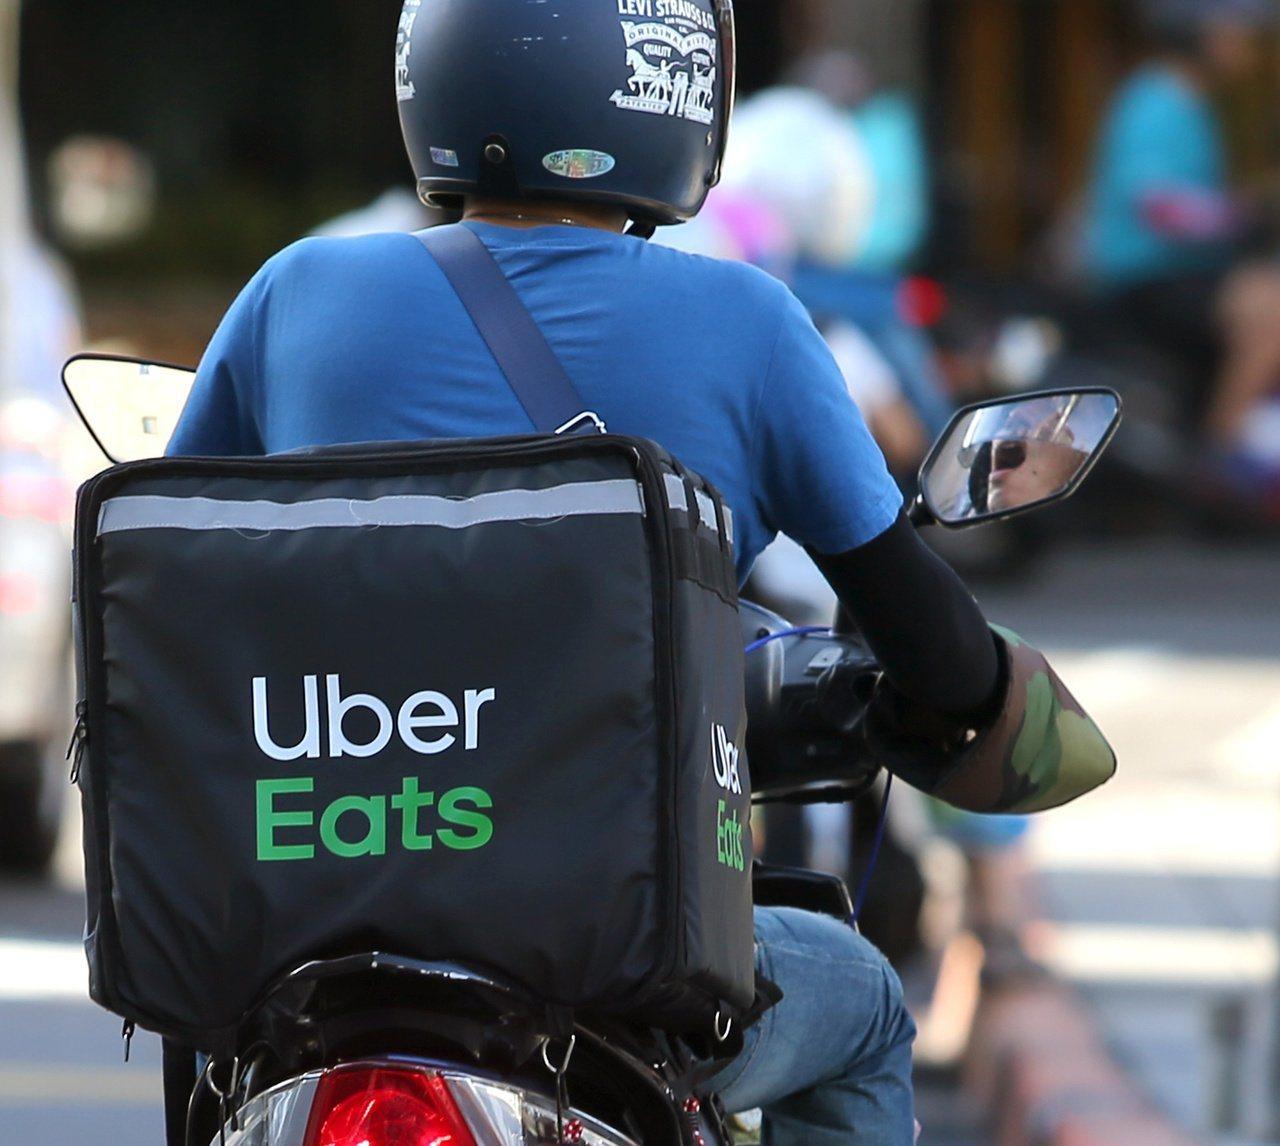 UBER EATS外送員示意圖,非當事人。圖/報系資料照